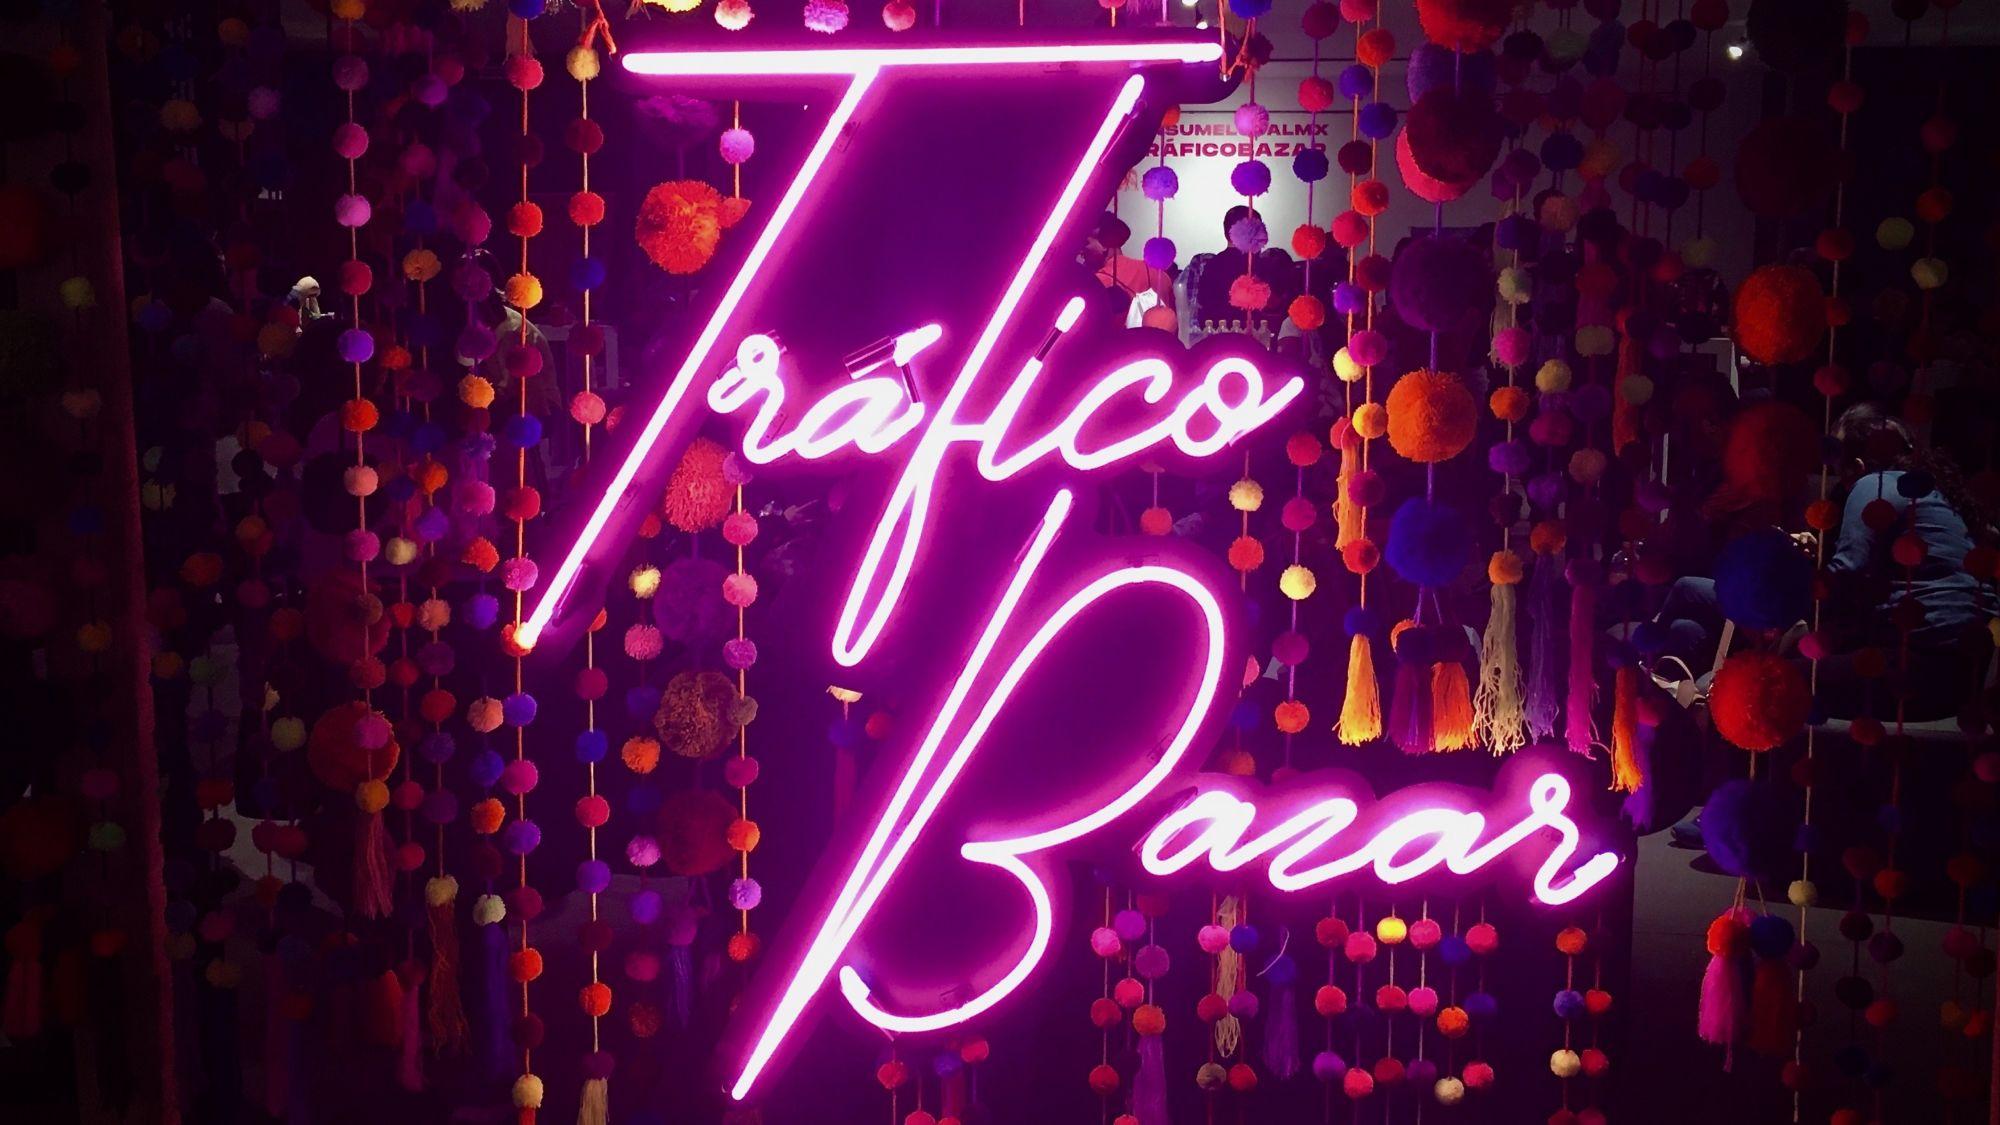 Tráfico Bazar